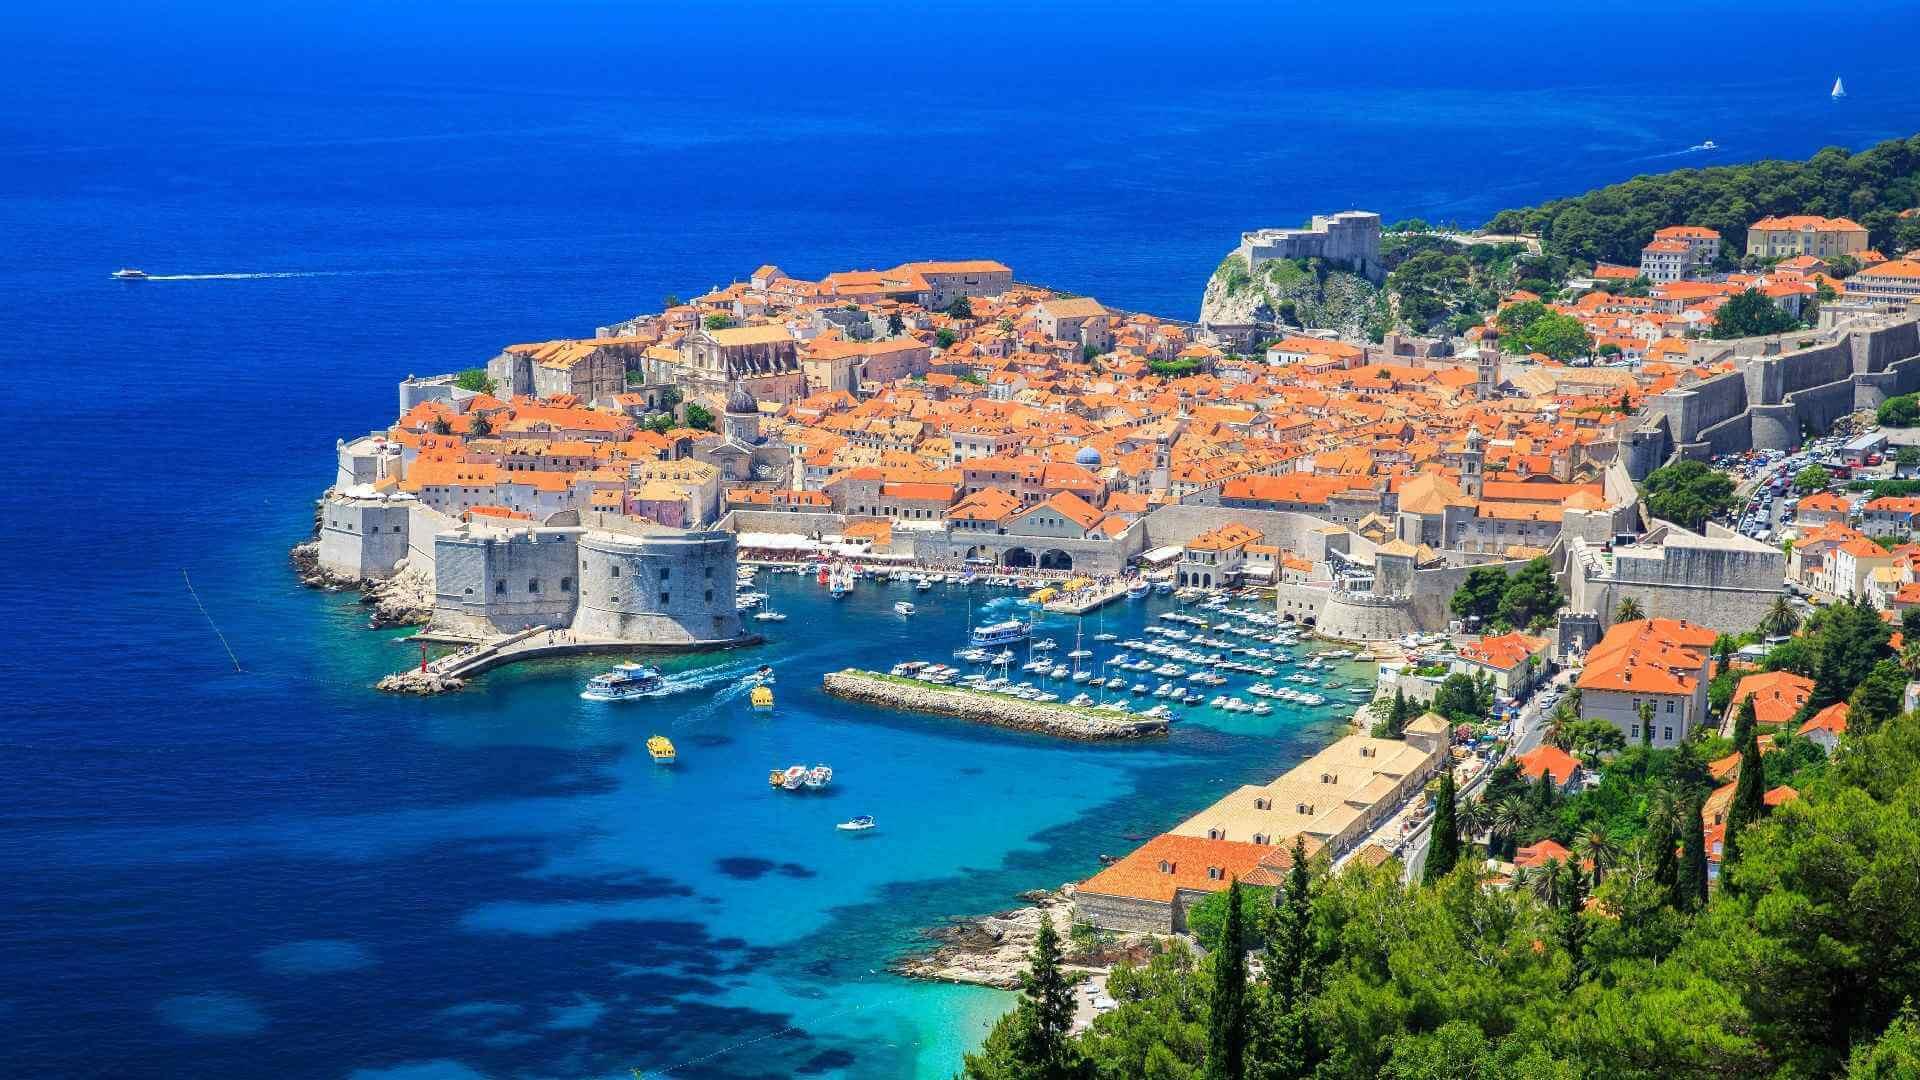 Luxury Villas in Dubrovnik Croatia with private pools